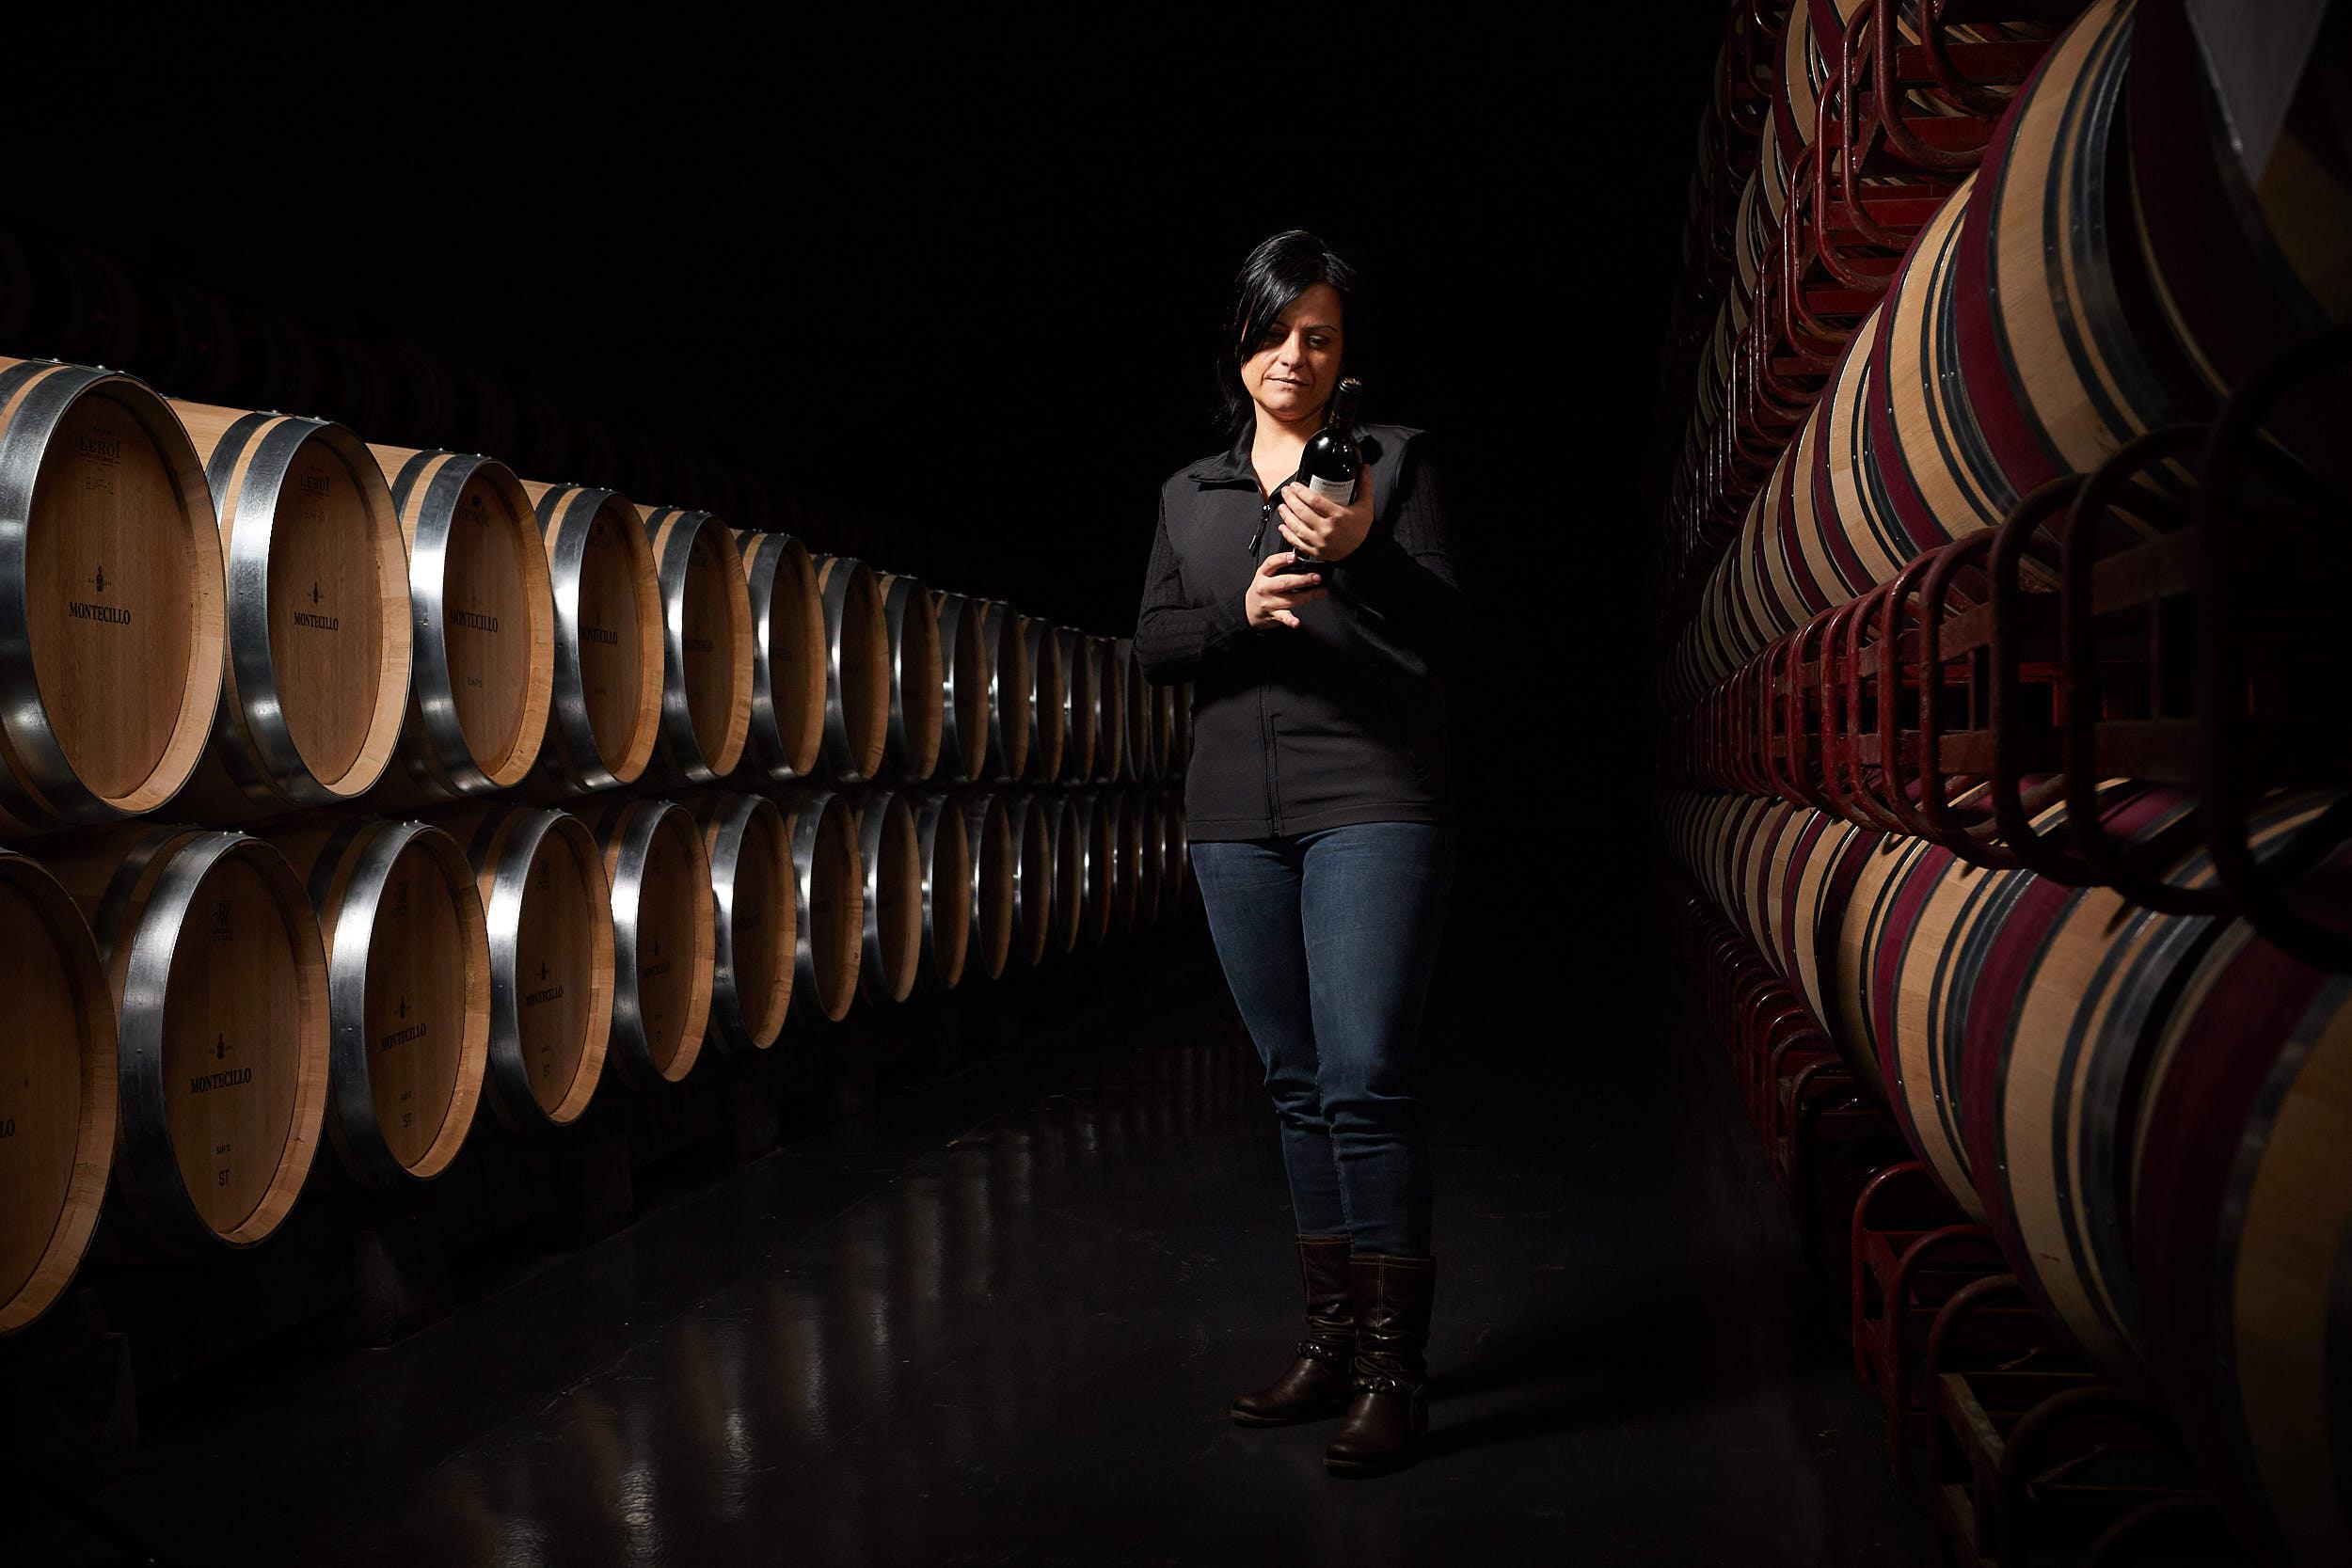 Bodegas_Montecillo_Wine_Photography_La_Rioja_Spain_James_Sturcke_sturcke.org